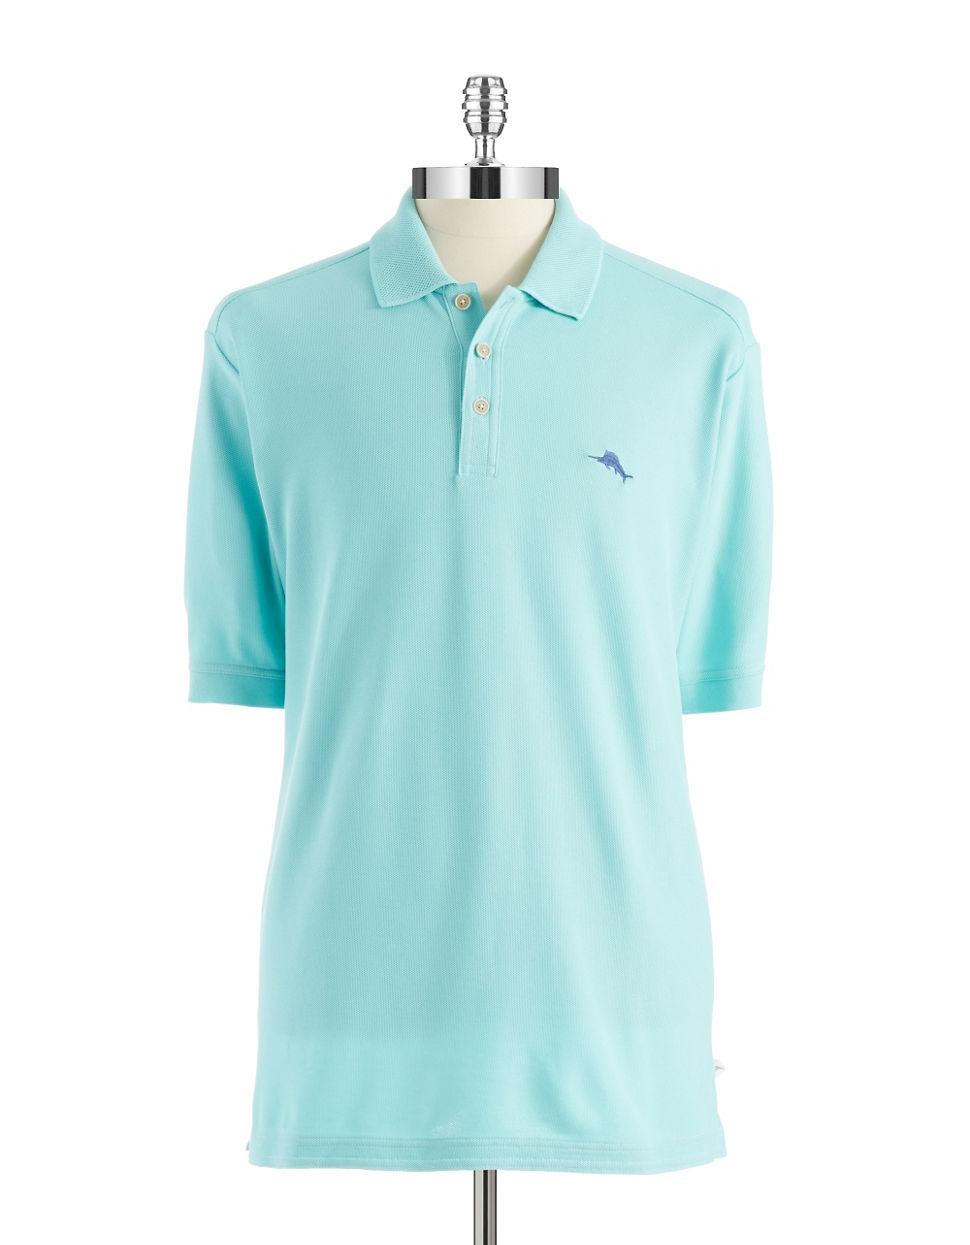 Lyst Tommy Bahama Emfielder Polo Shirt In Blue For Men